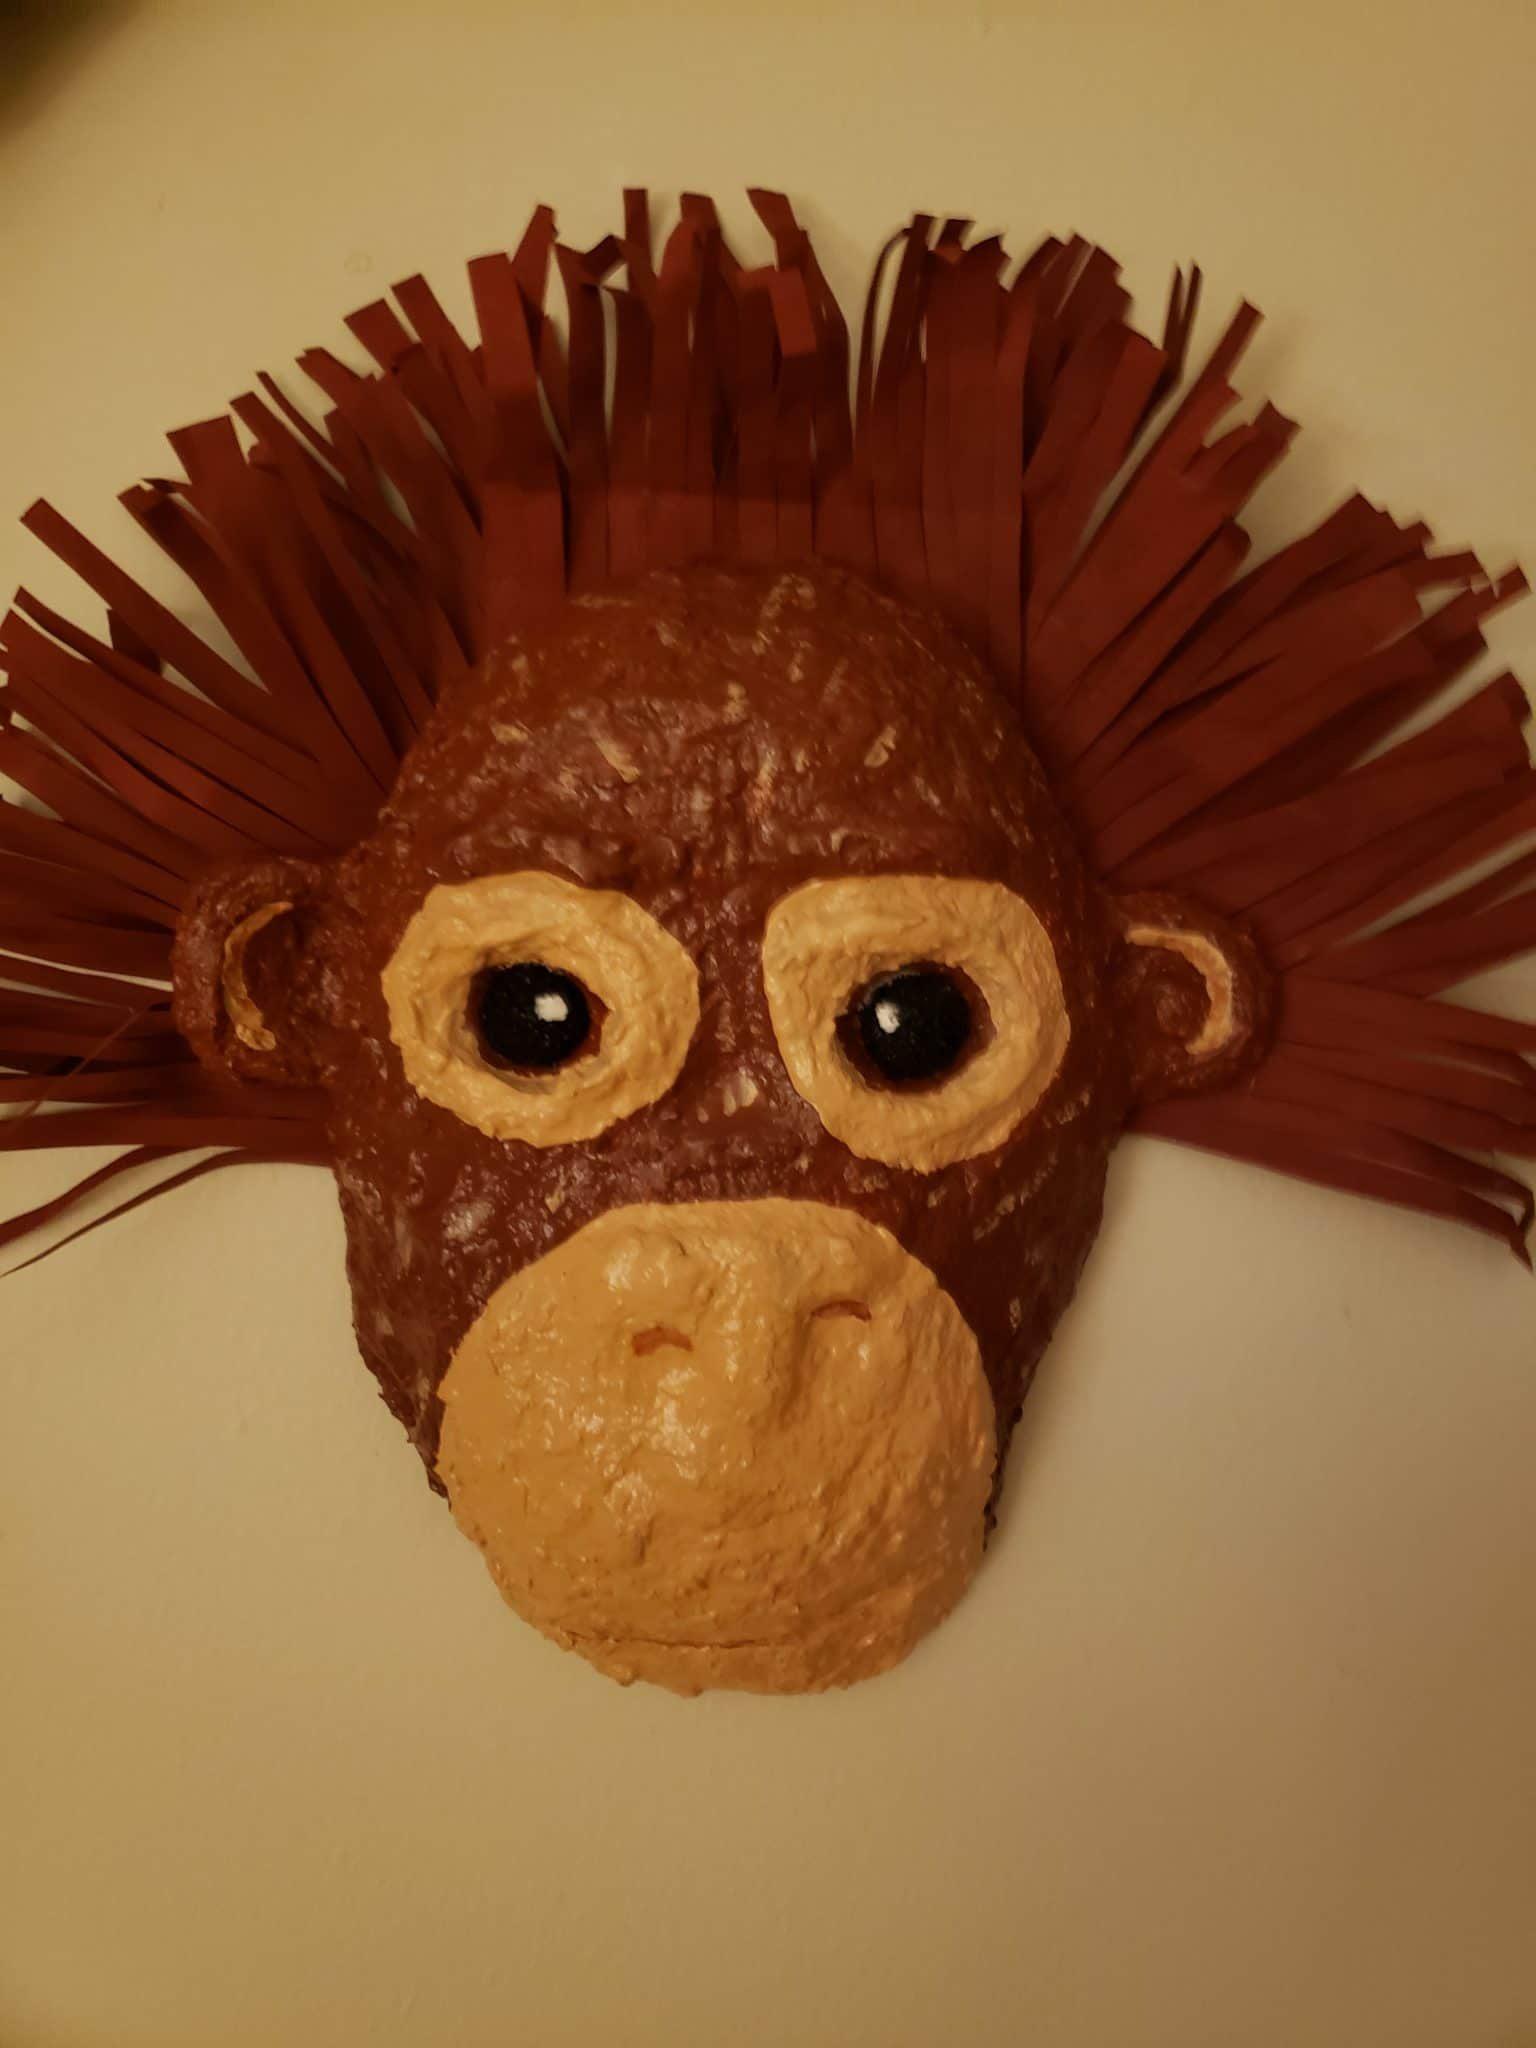 Oliver, the paper mache baby orangutan